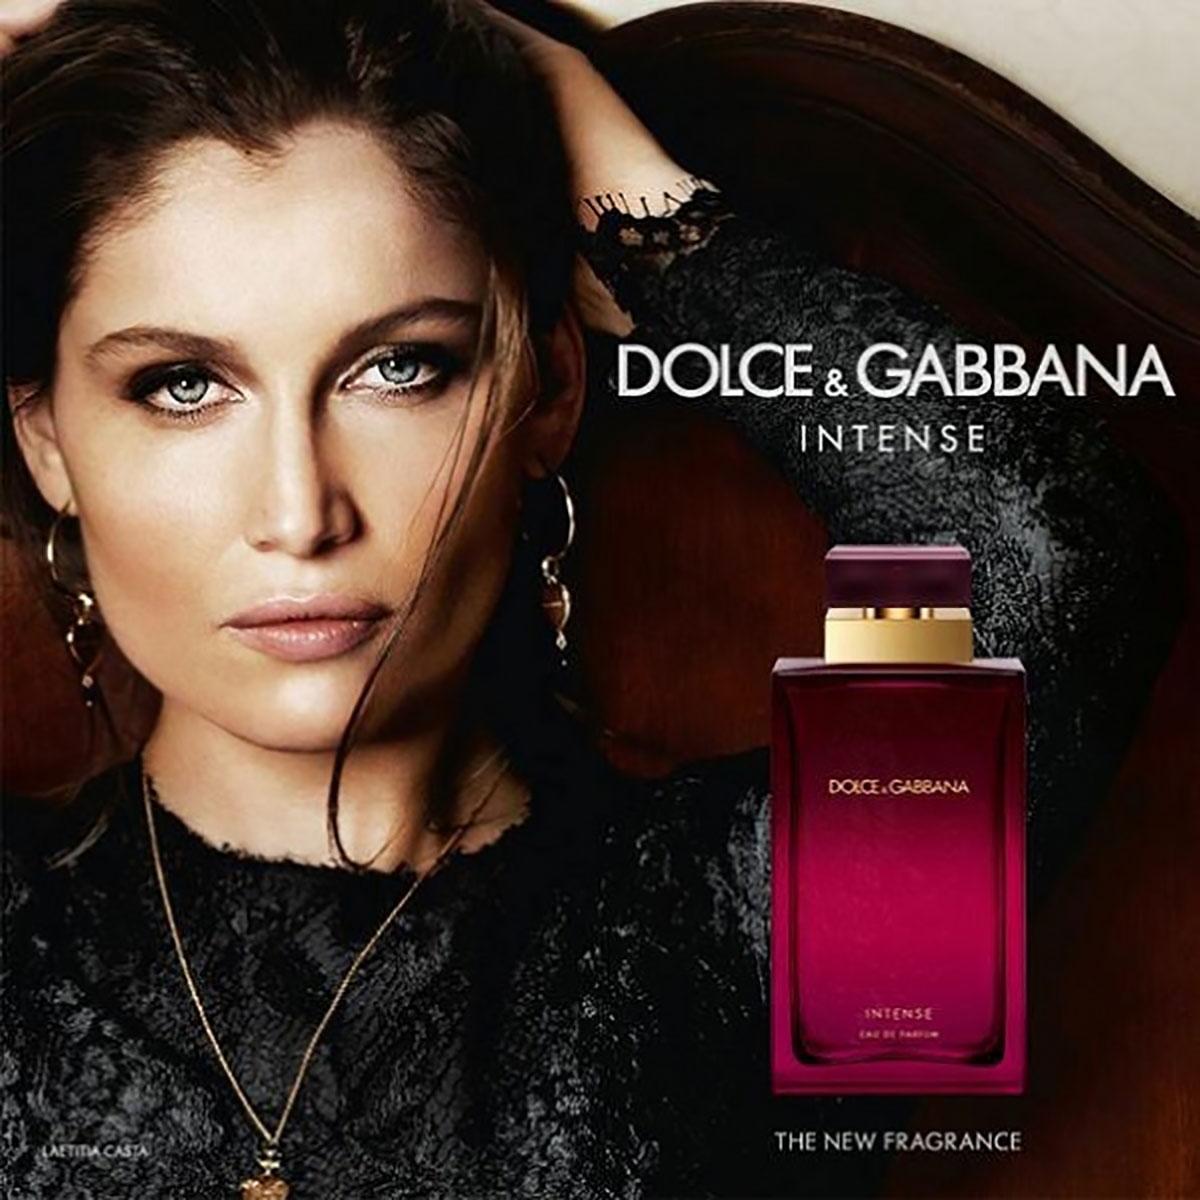 Nước hoa nữ Dolce&Gabbana Pour Femme Intense của hãng DOLCE&GABBANA